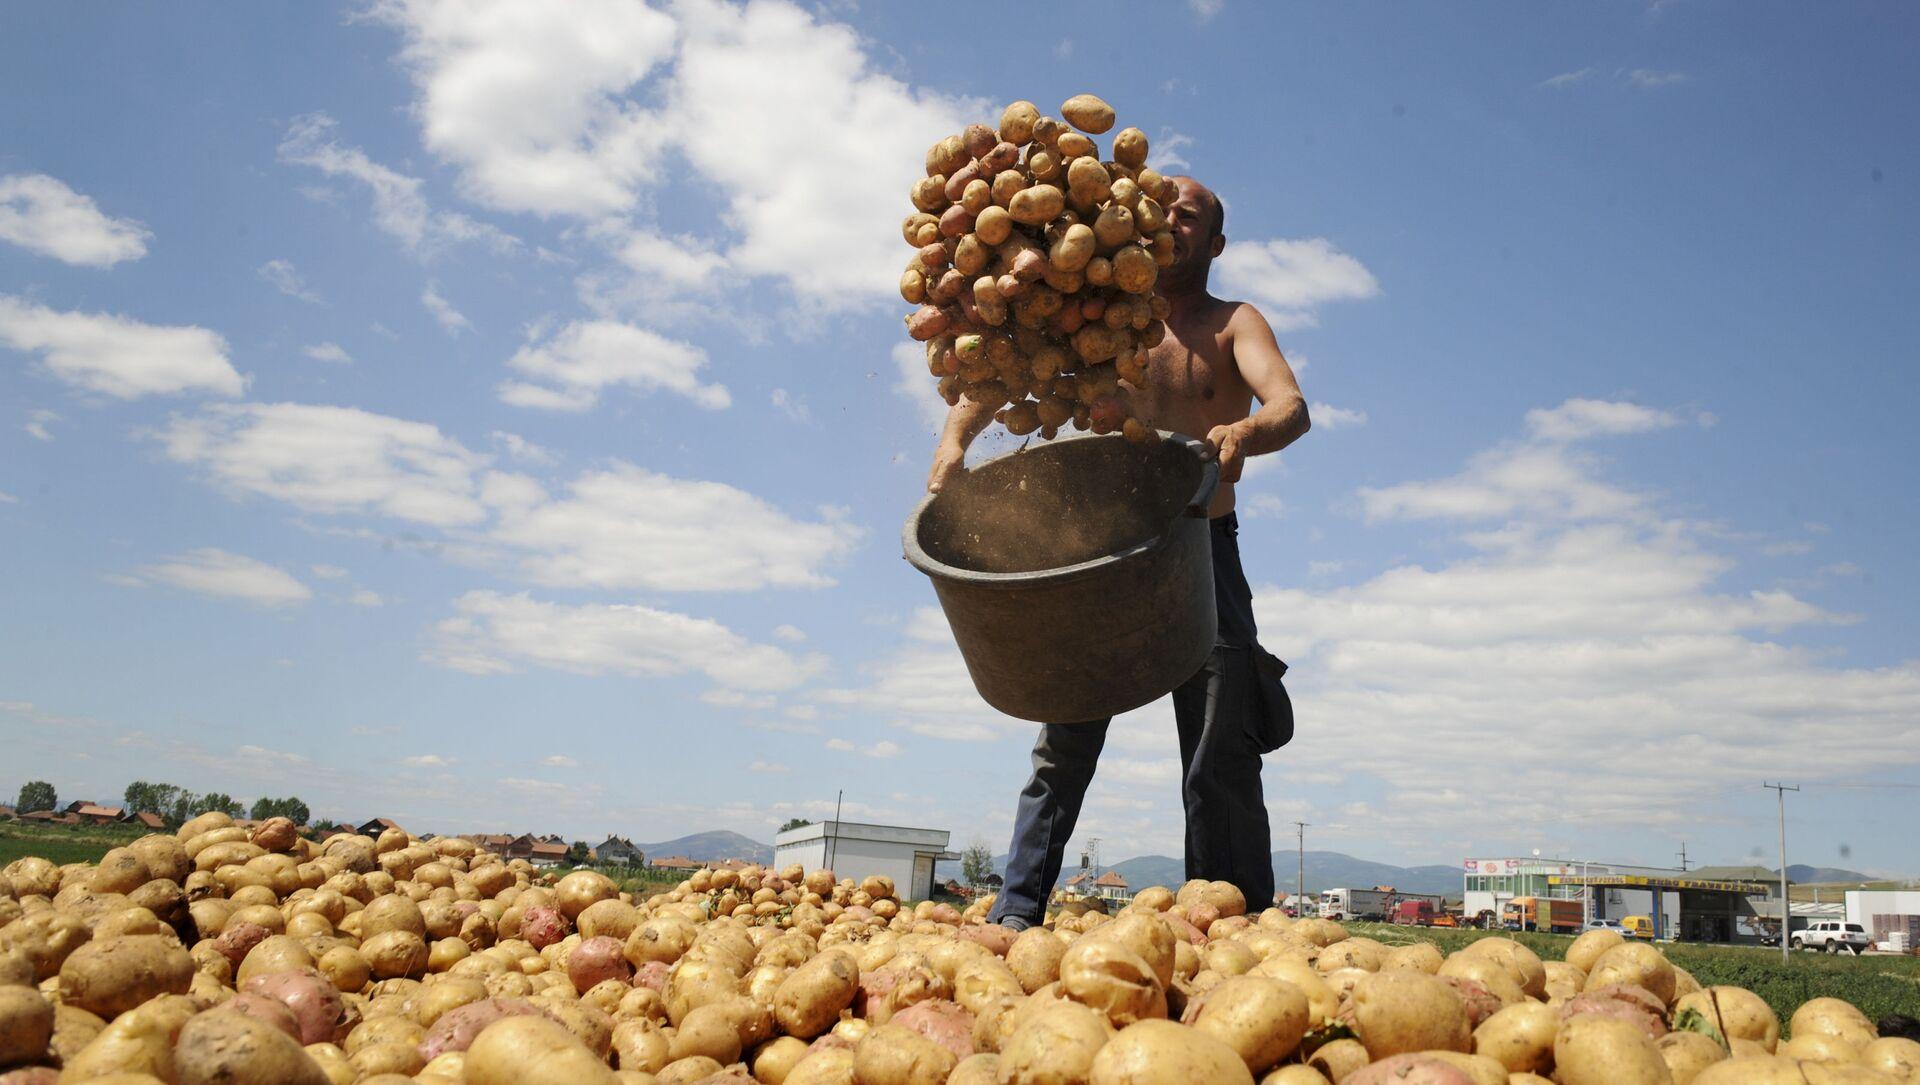 Урожай картофеля - Sputnik Azərbaycan, 1920, 22.07.2021